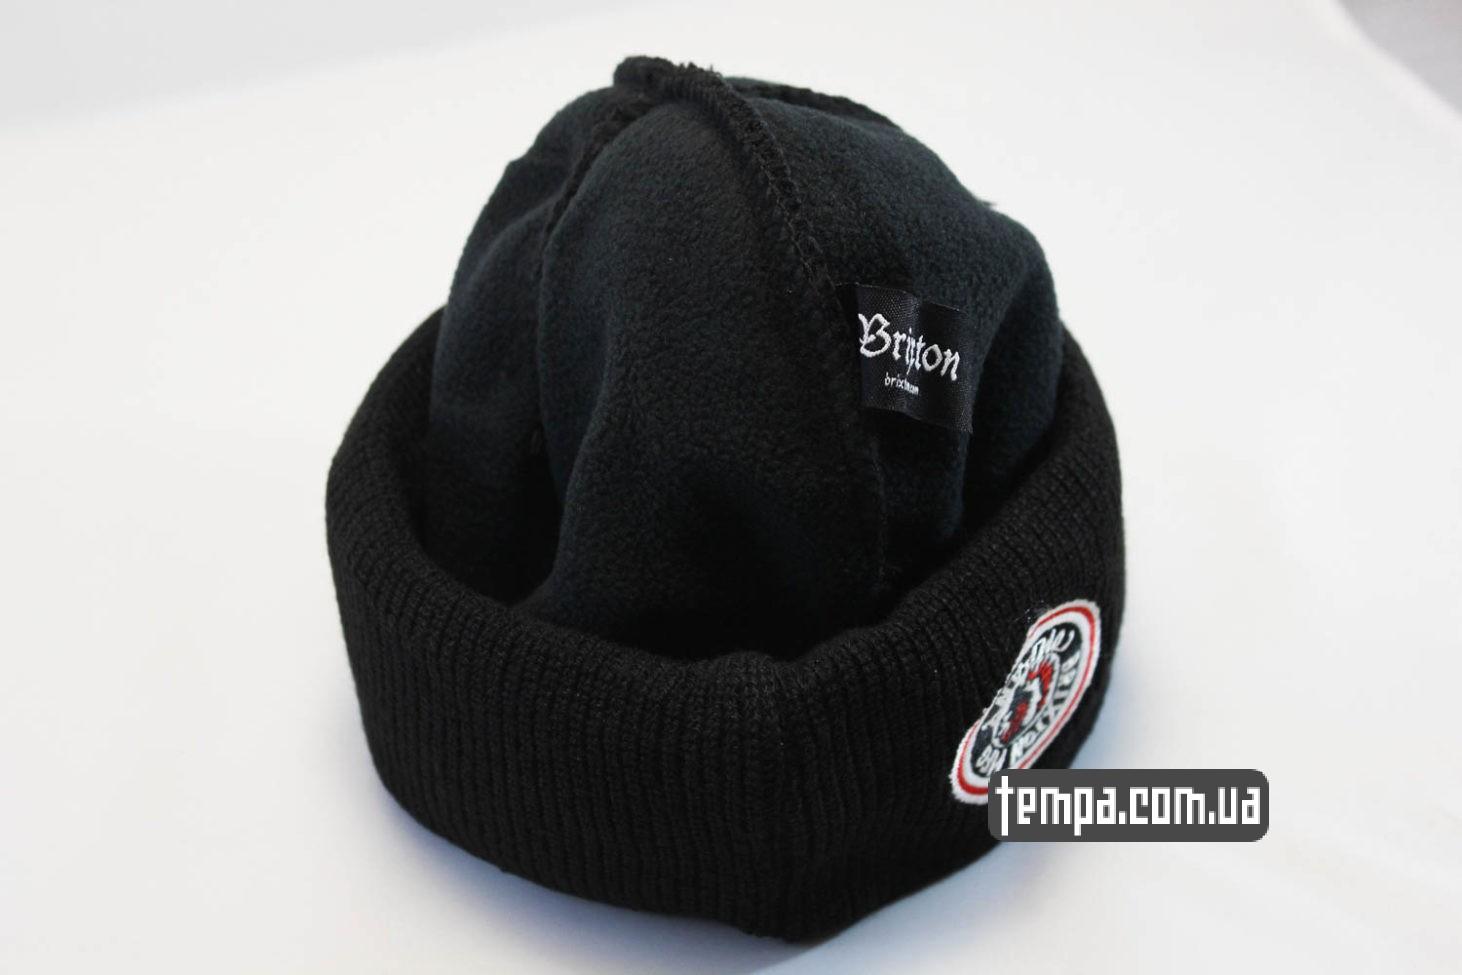 теплая мужская женская шапрка beanie BRIXTON mfg company черная с индейцем